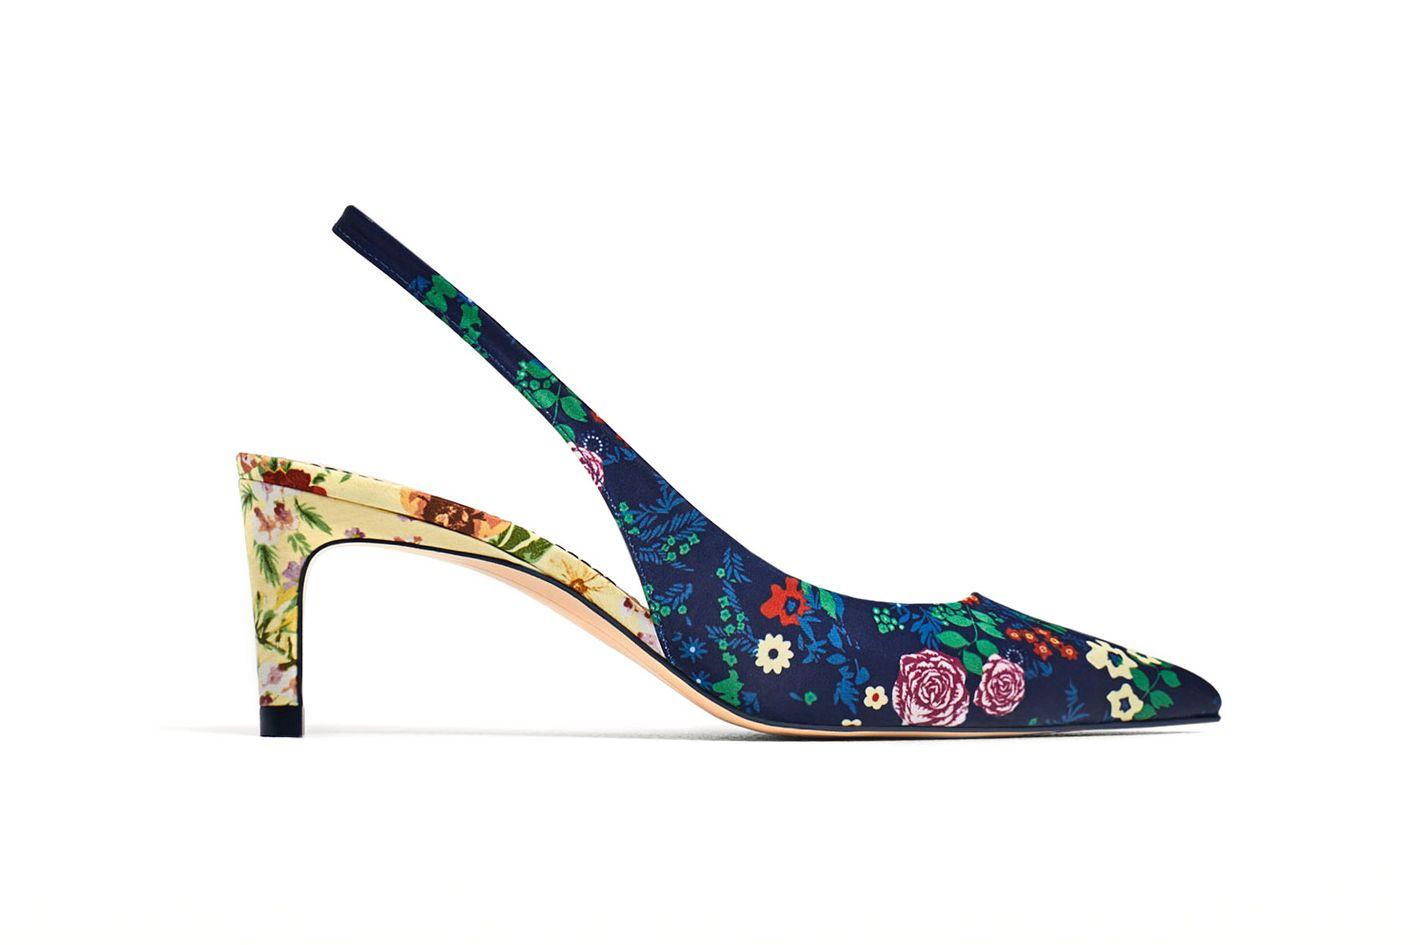 Zara Printed Slingback Kitten Heels